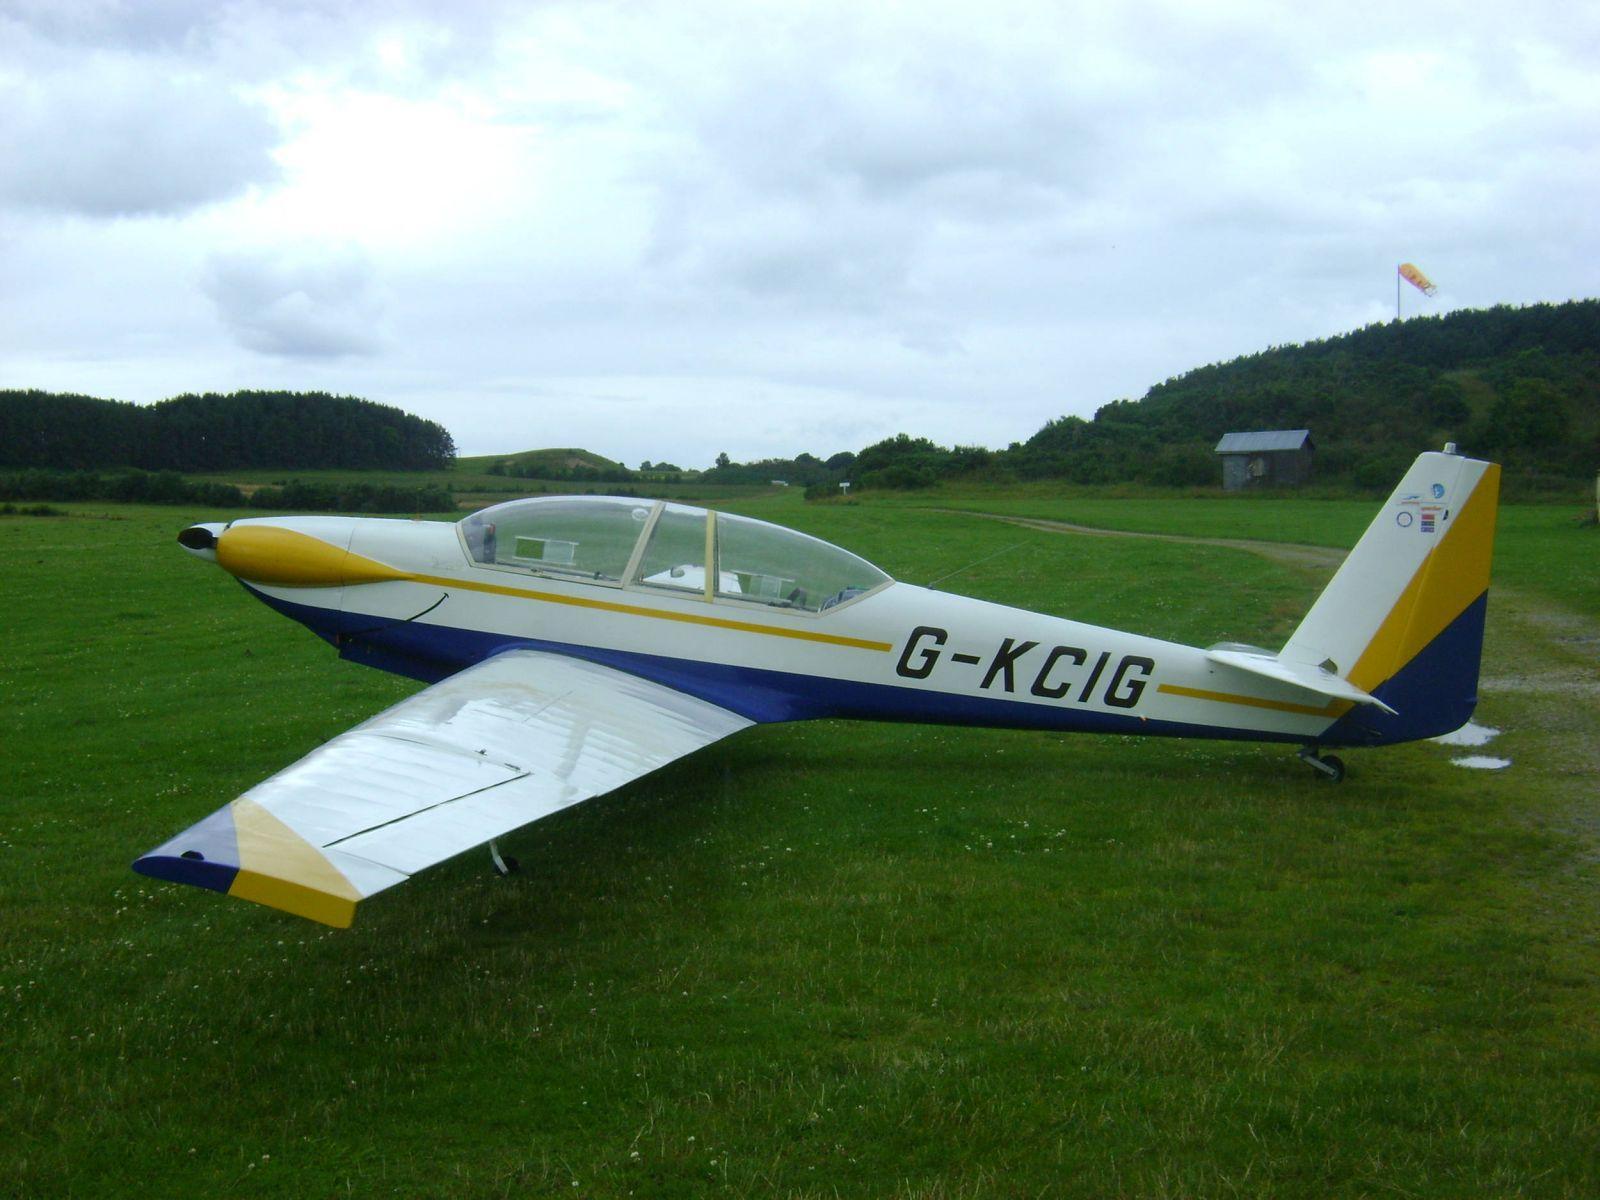 G-KCIG at Easterton Airfield